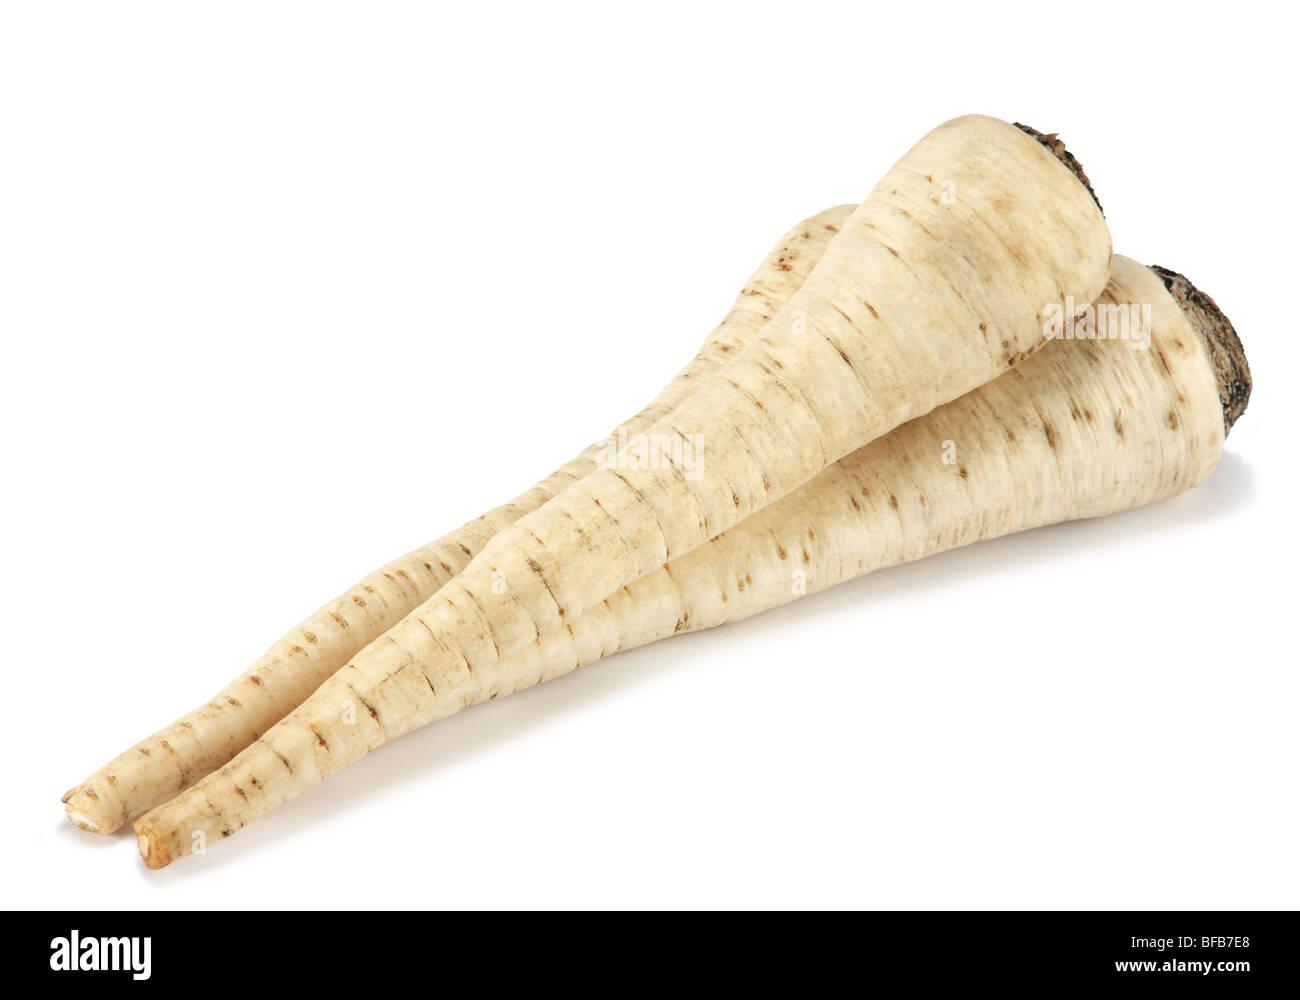 Perejil de raíz vegetal closeup sobre fondo blanco. Imagen De Stock